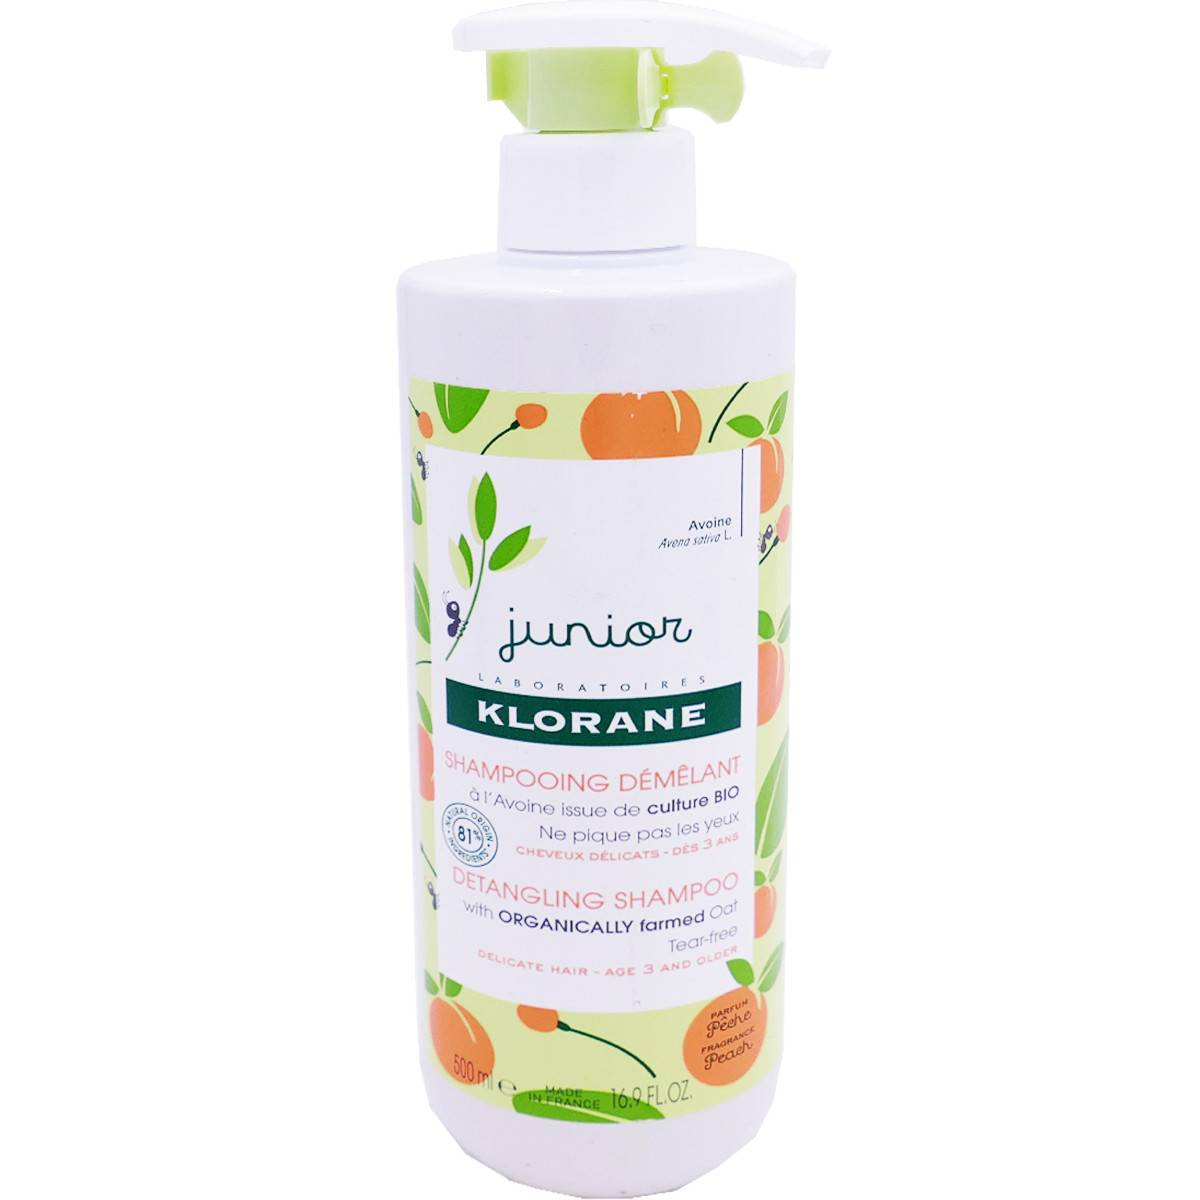 Klorane junior shampooing demelant 500 ml